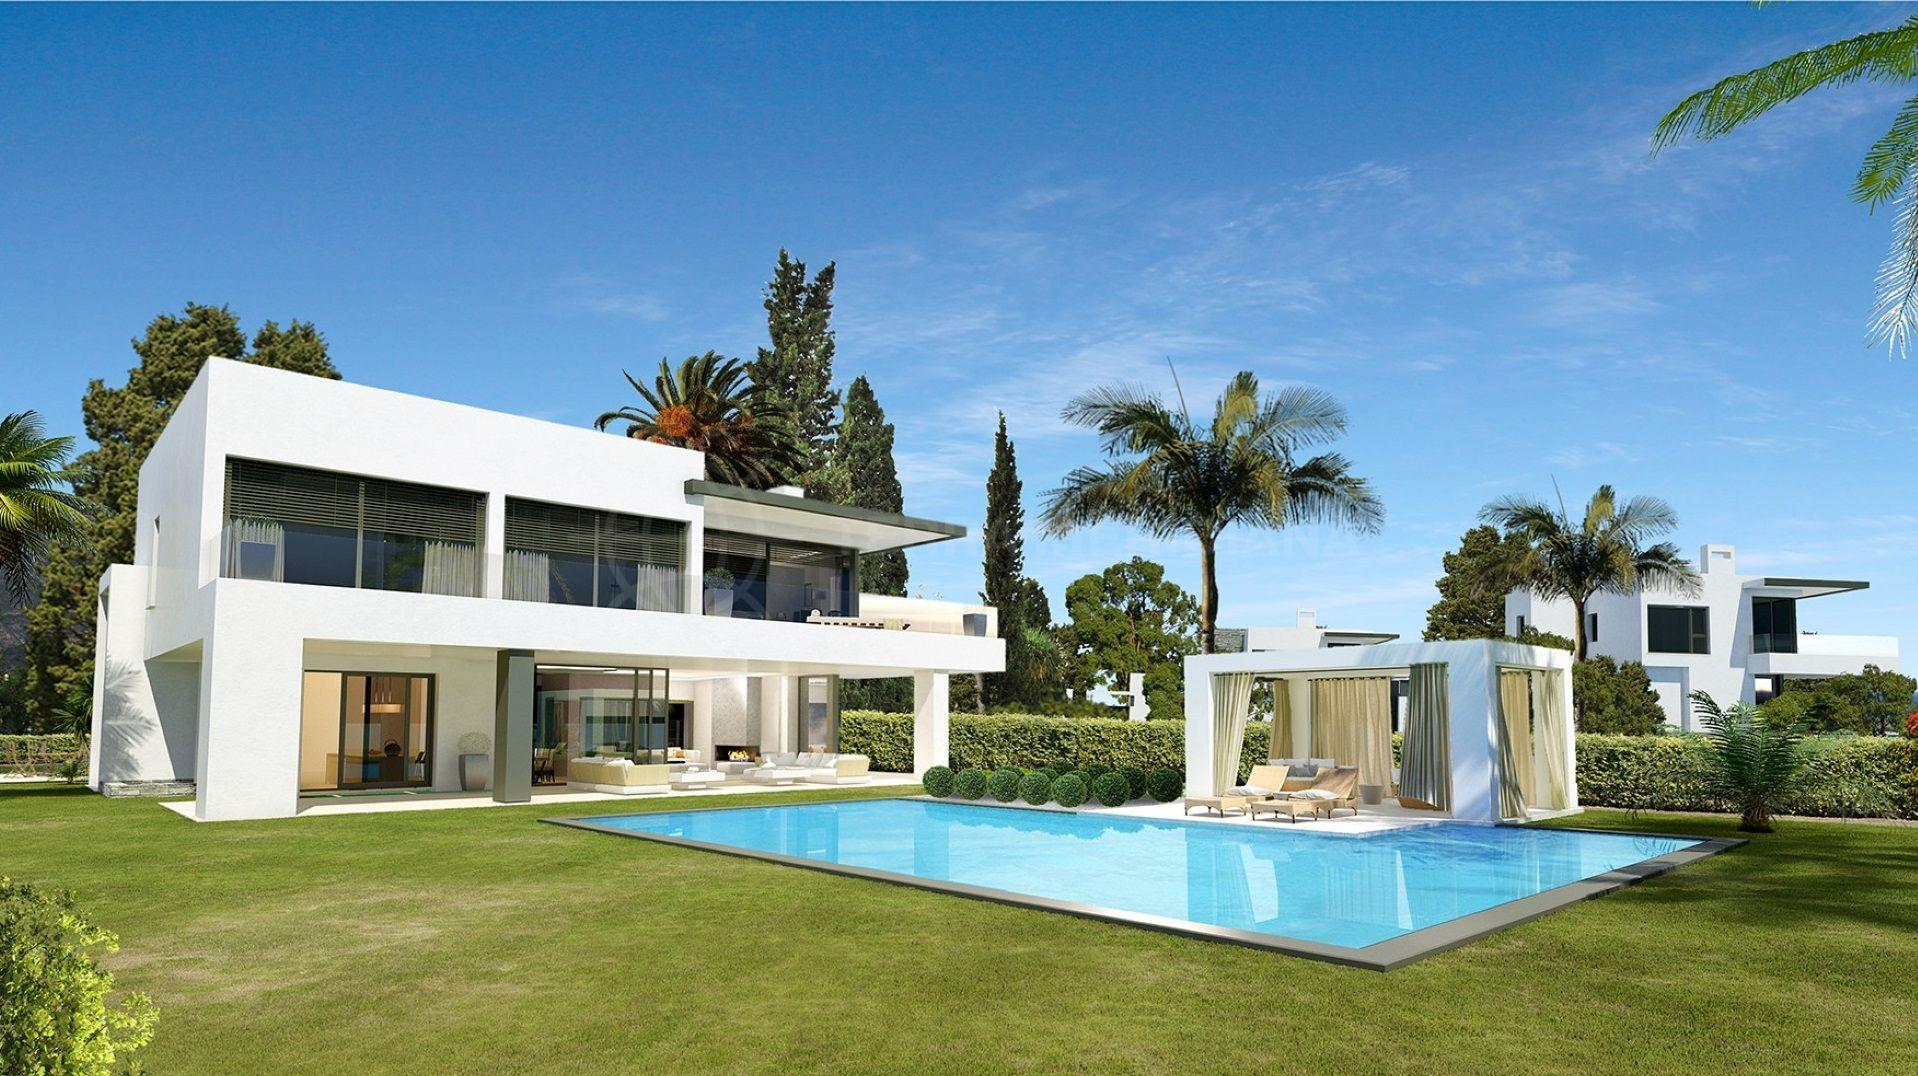 exclusive new development of luxury 4 bedroom villas in marbella s golden mile. Black Bedroom Furniture Sets. Home Design Ideas